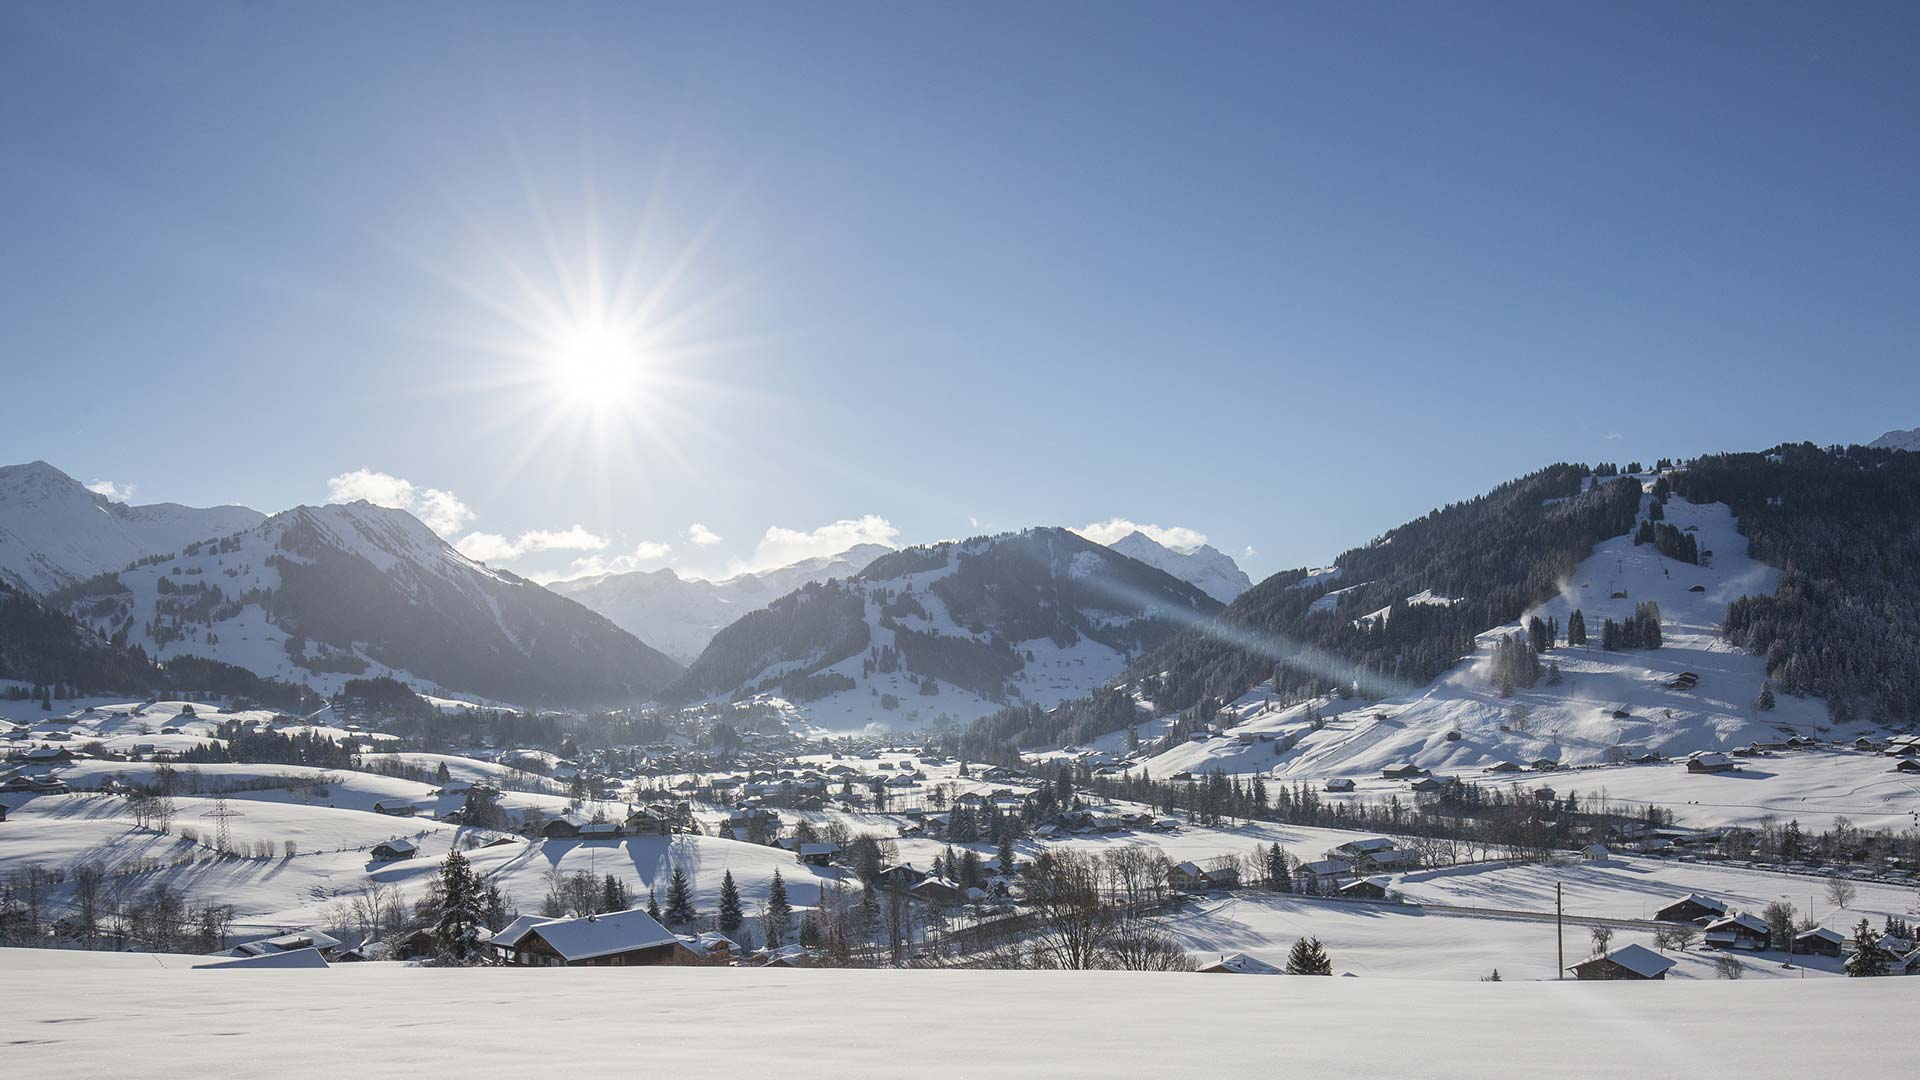 Luxury Hotel Marketing | HUUS Hotel | Gstaad Snow